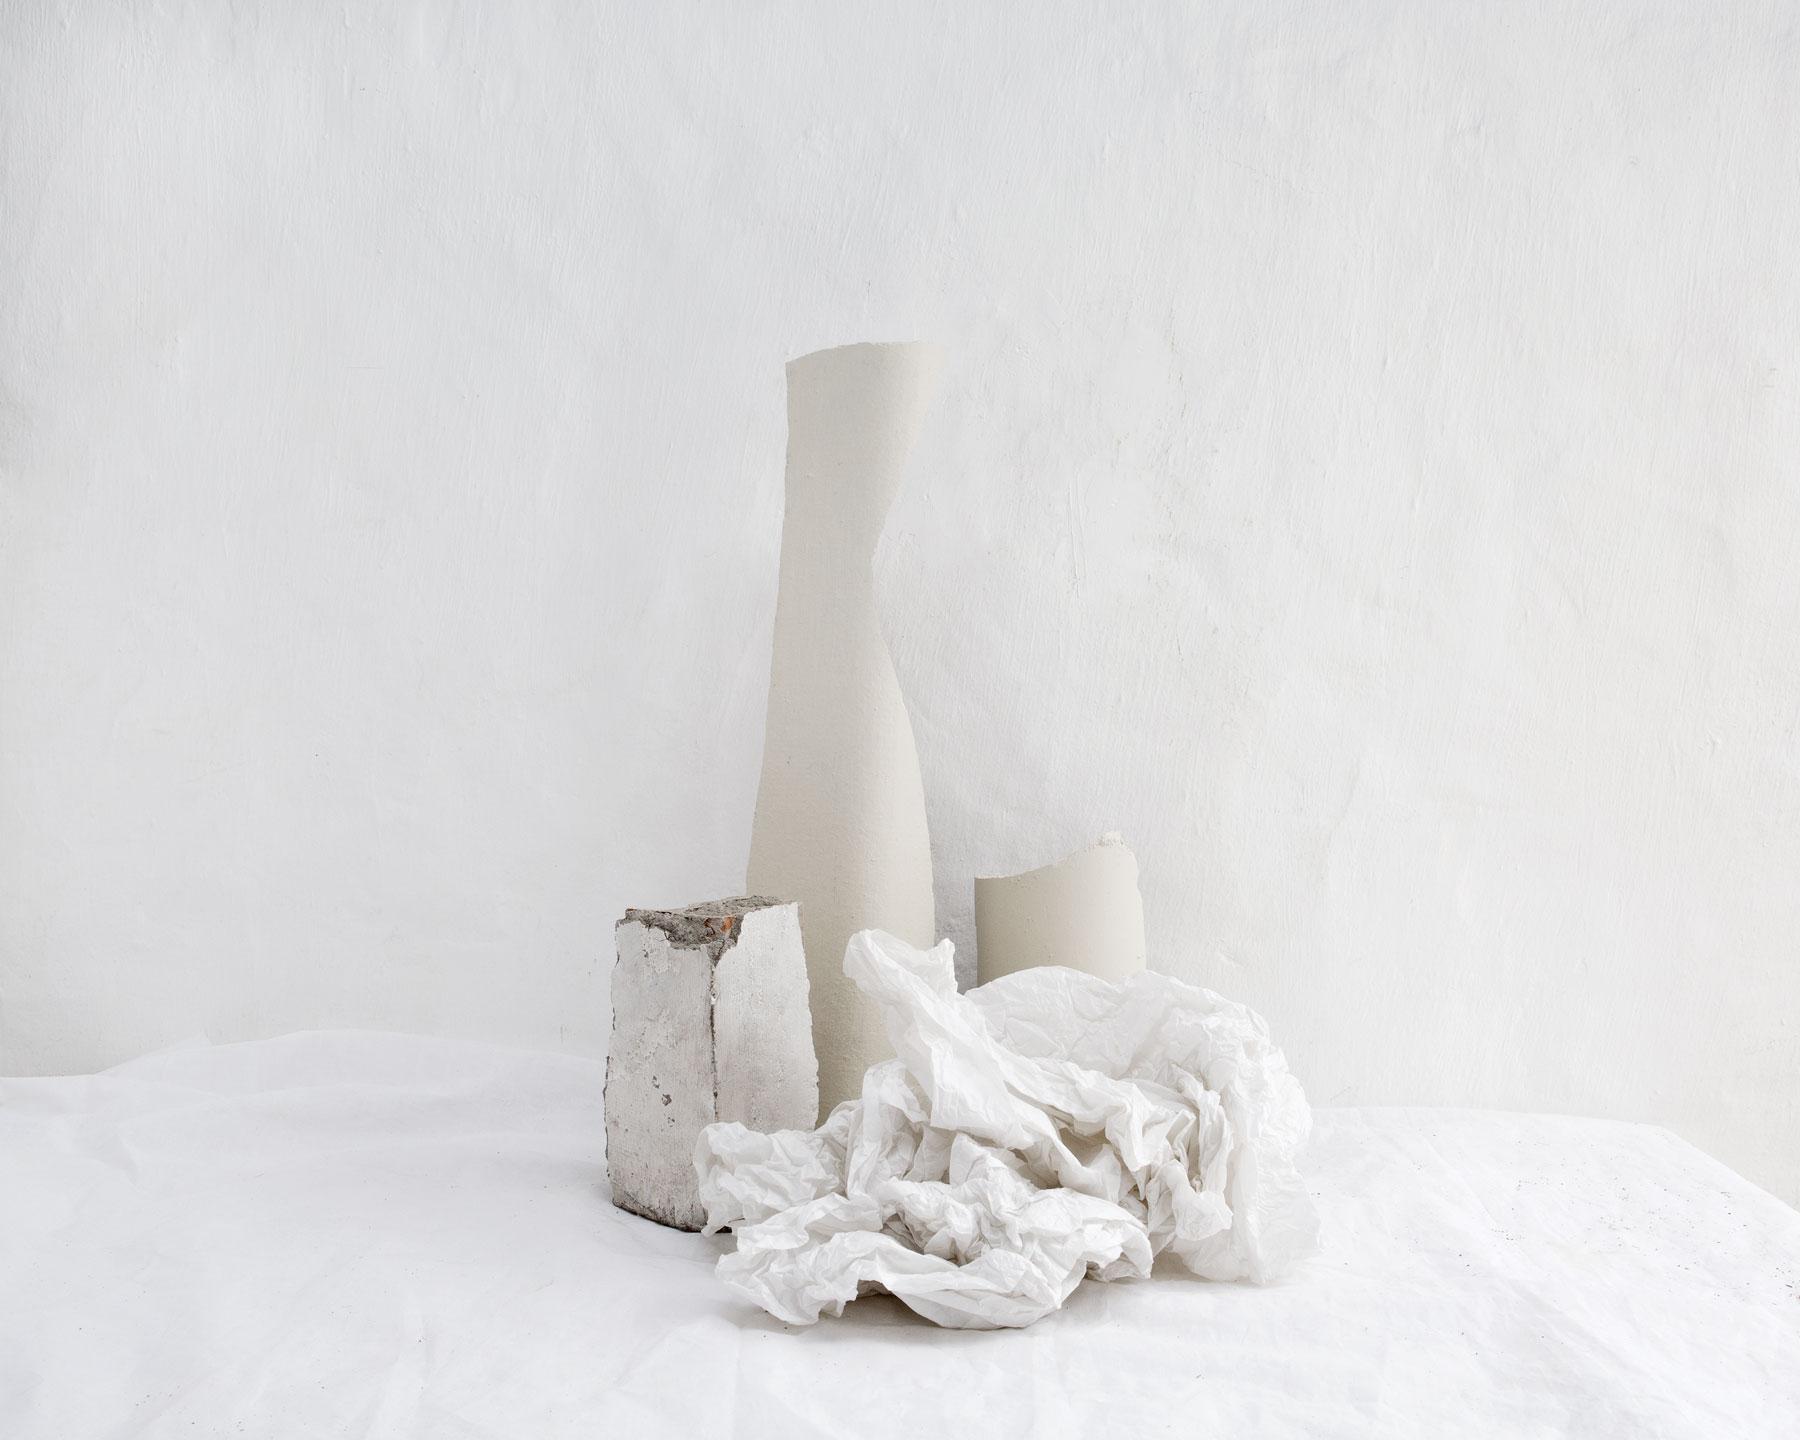 © Photograph by Marco Maria Zanin. 'Lacuna I' (2015) from Lacuna e Equilibrio series. Fine art print on cotton paper